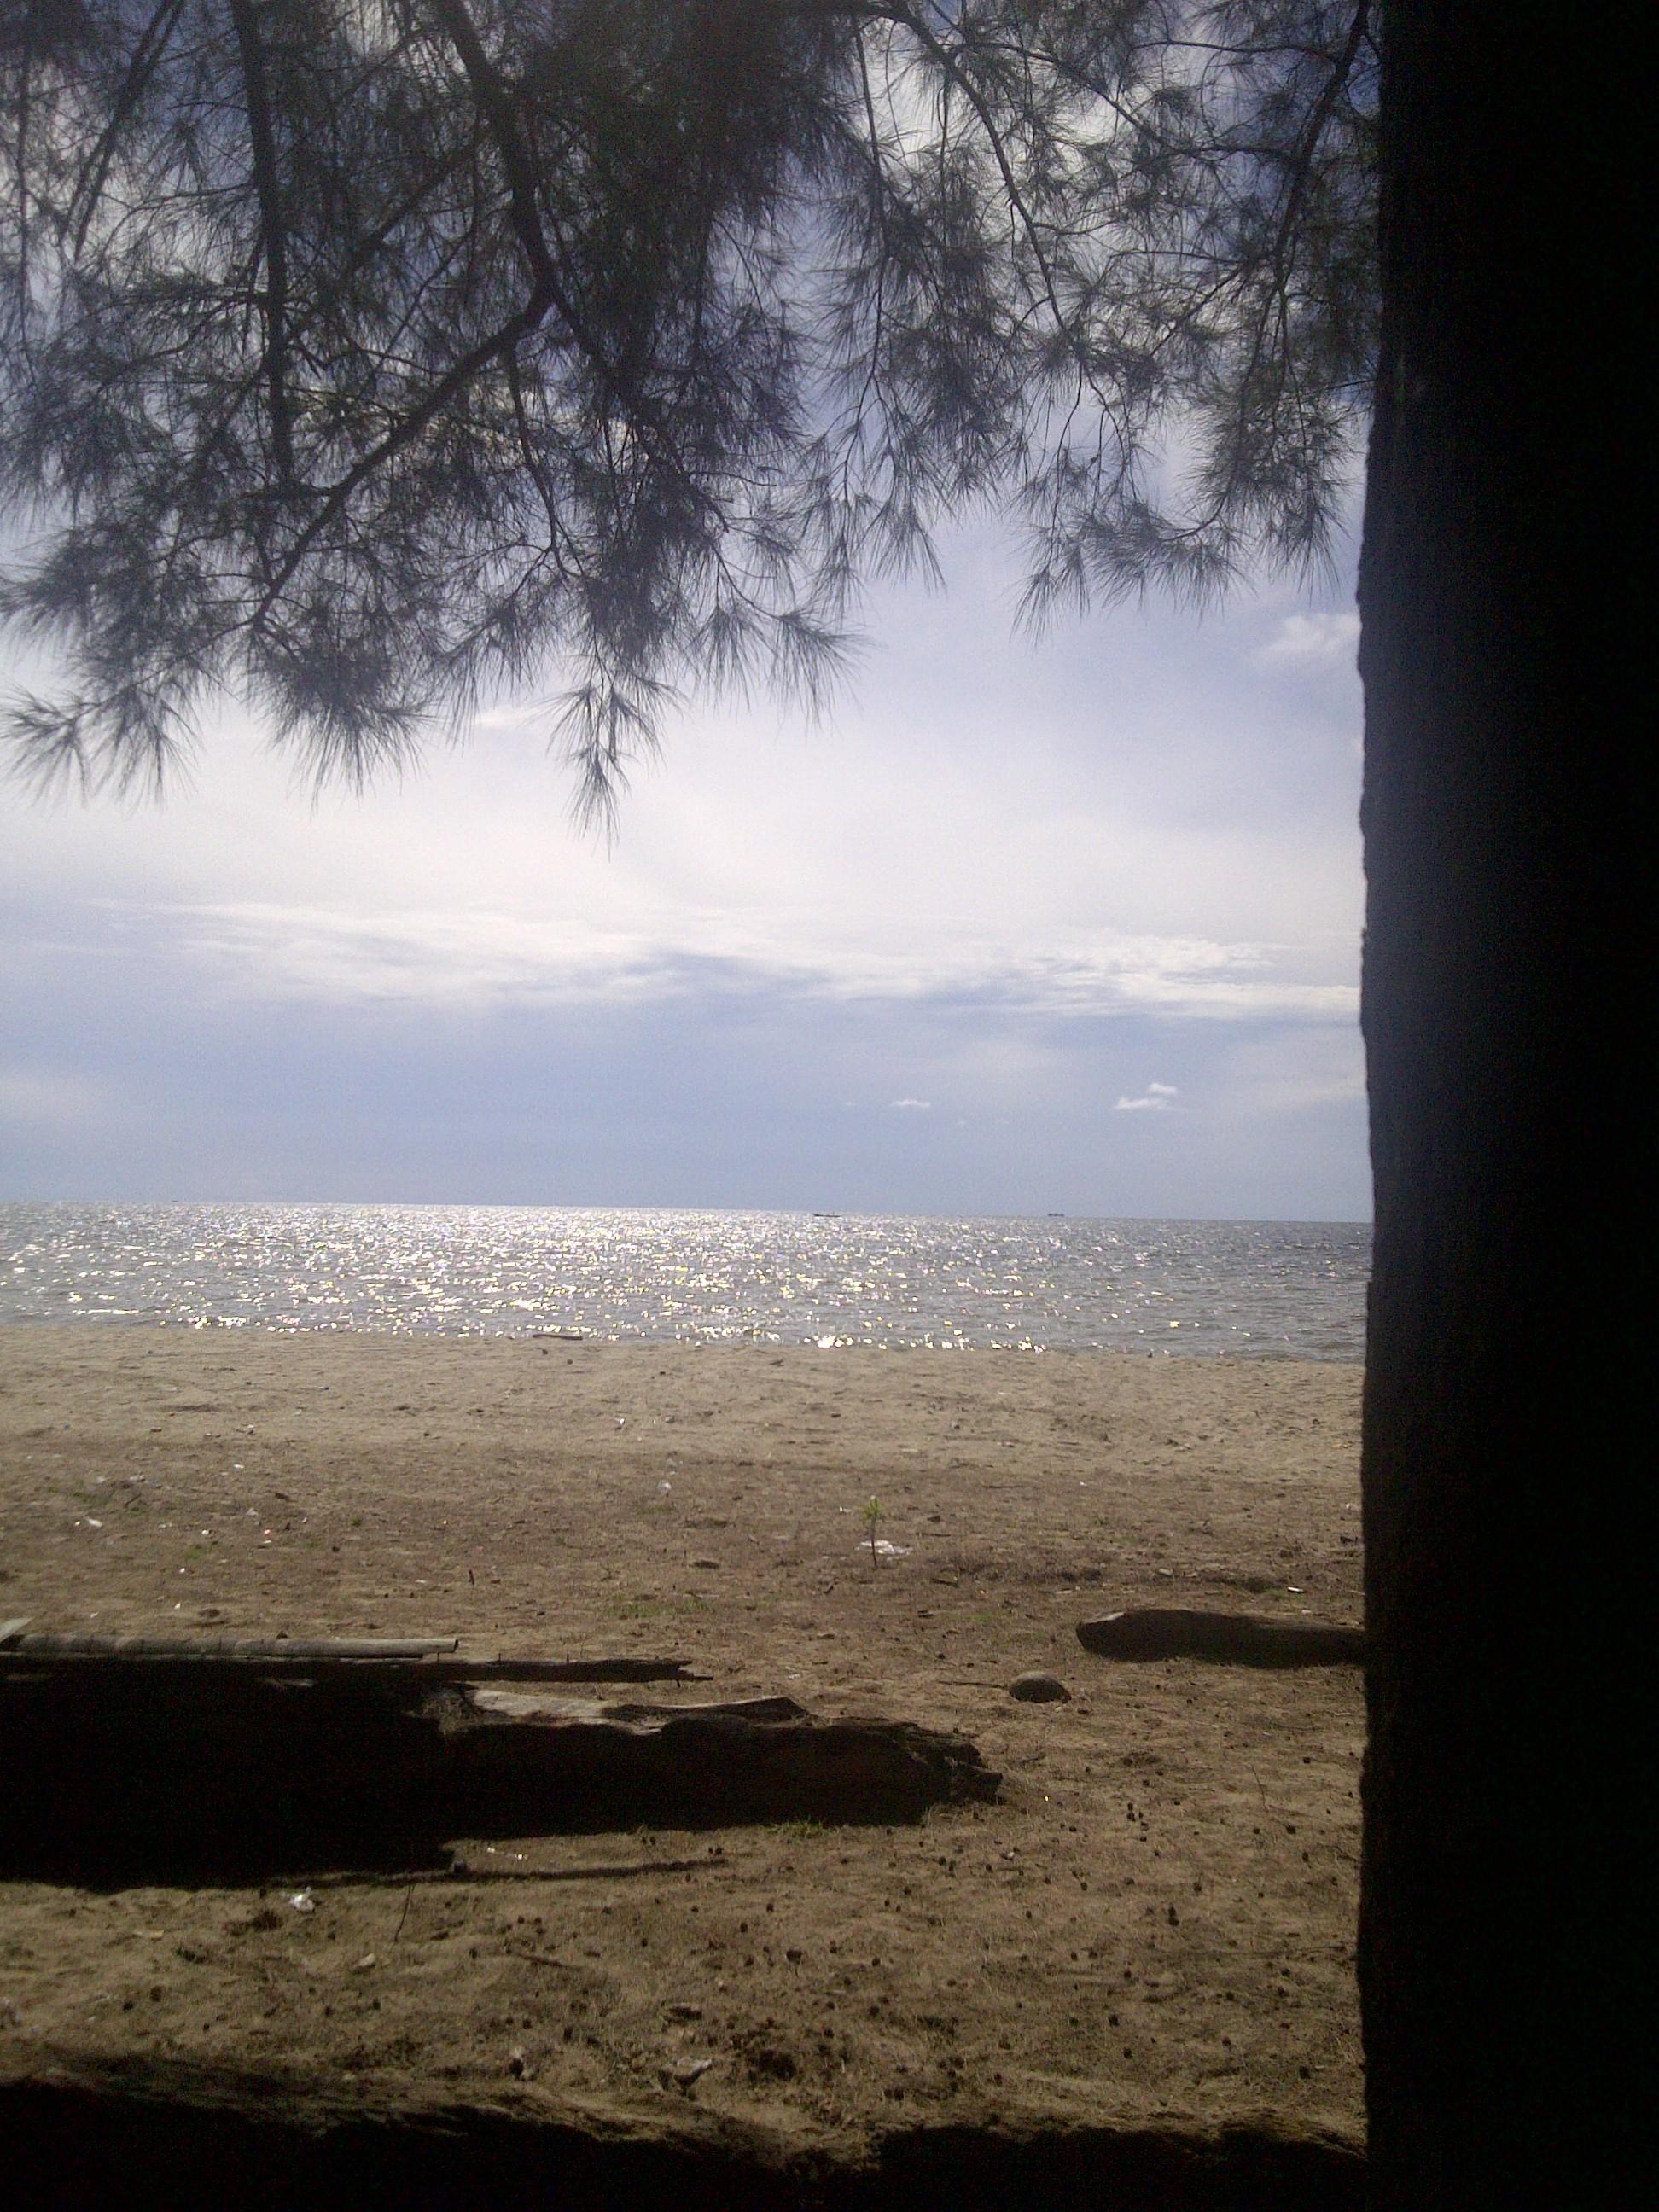 Beach, Sand, Sea, Tree, HQ Photo